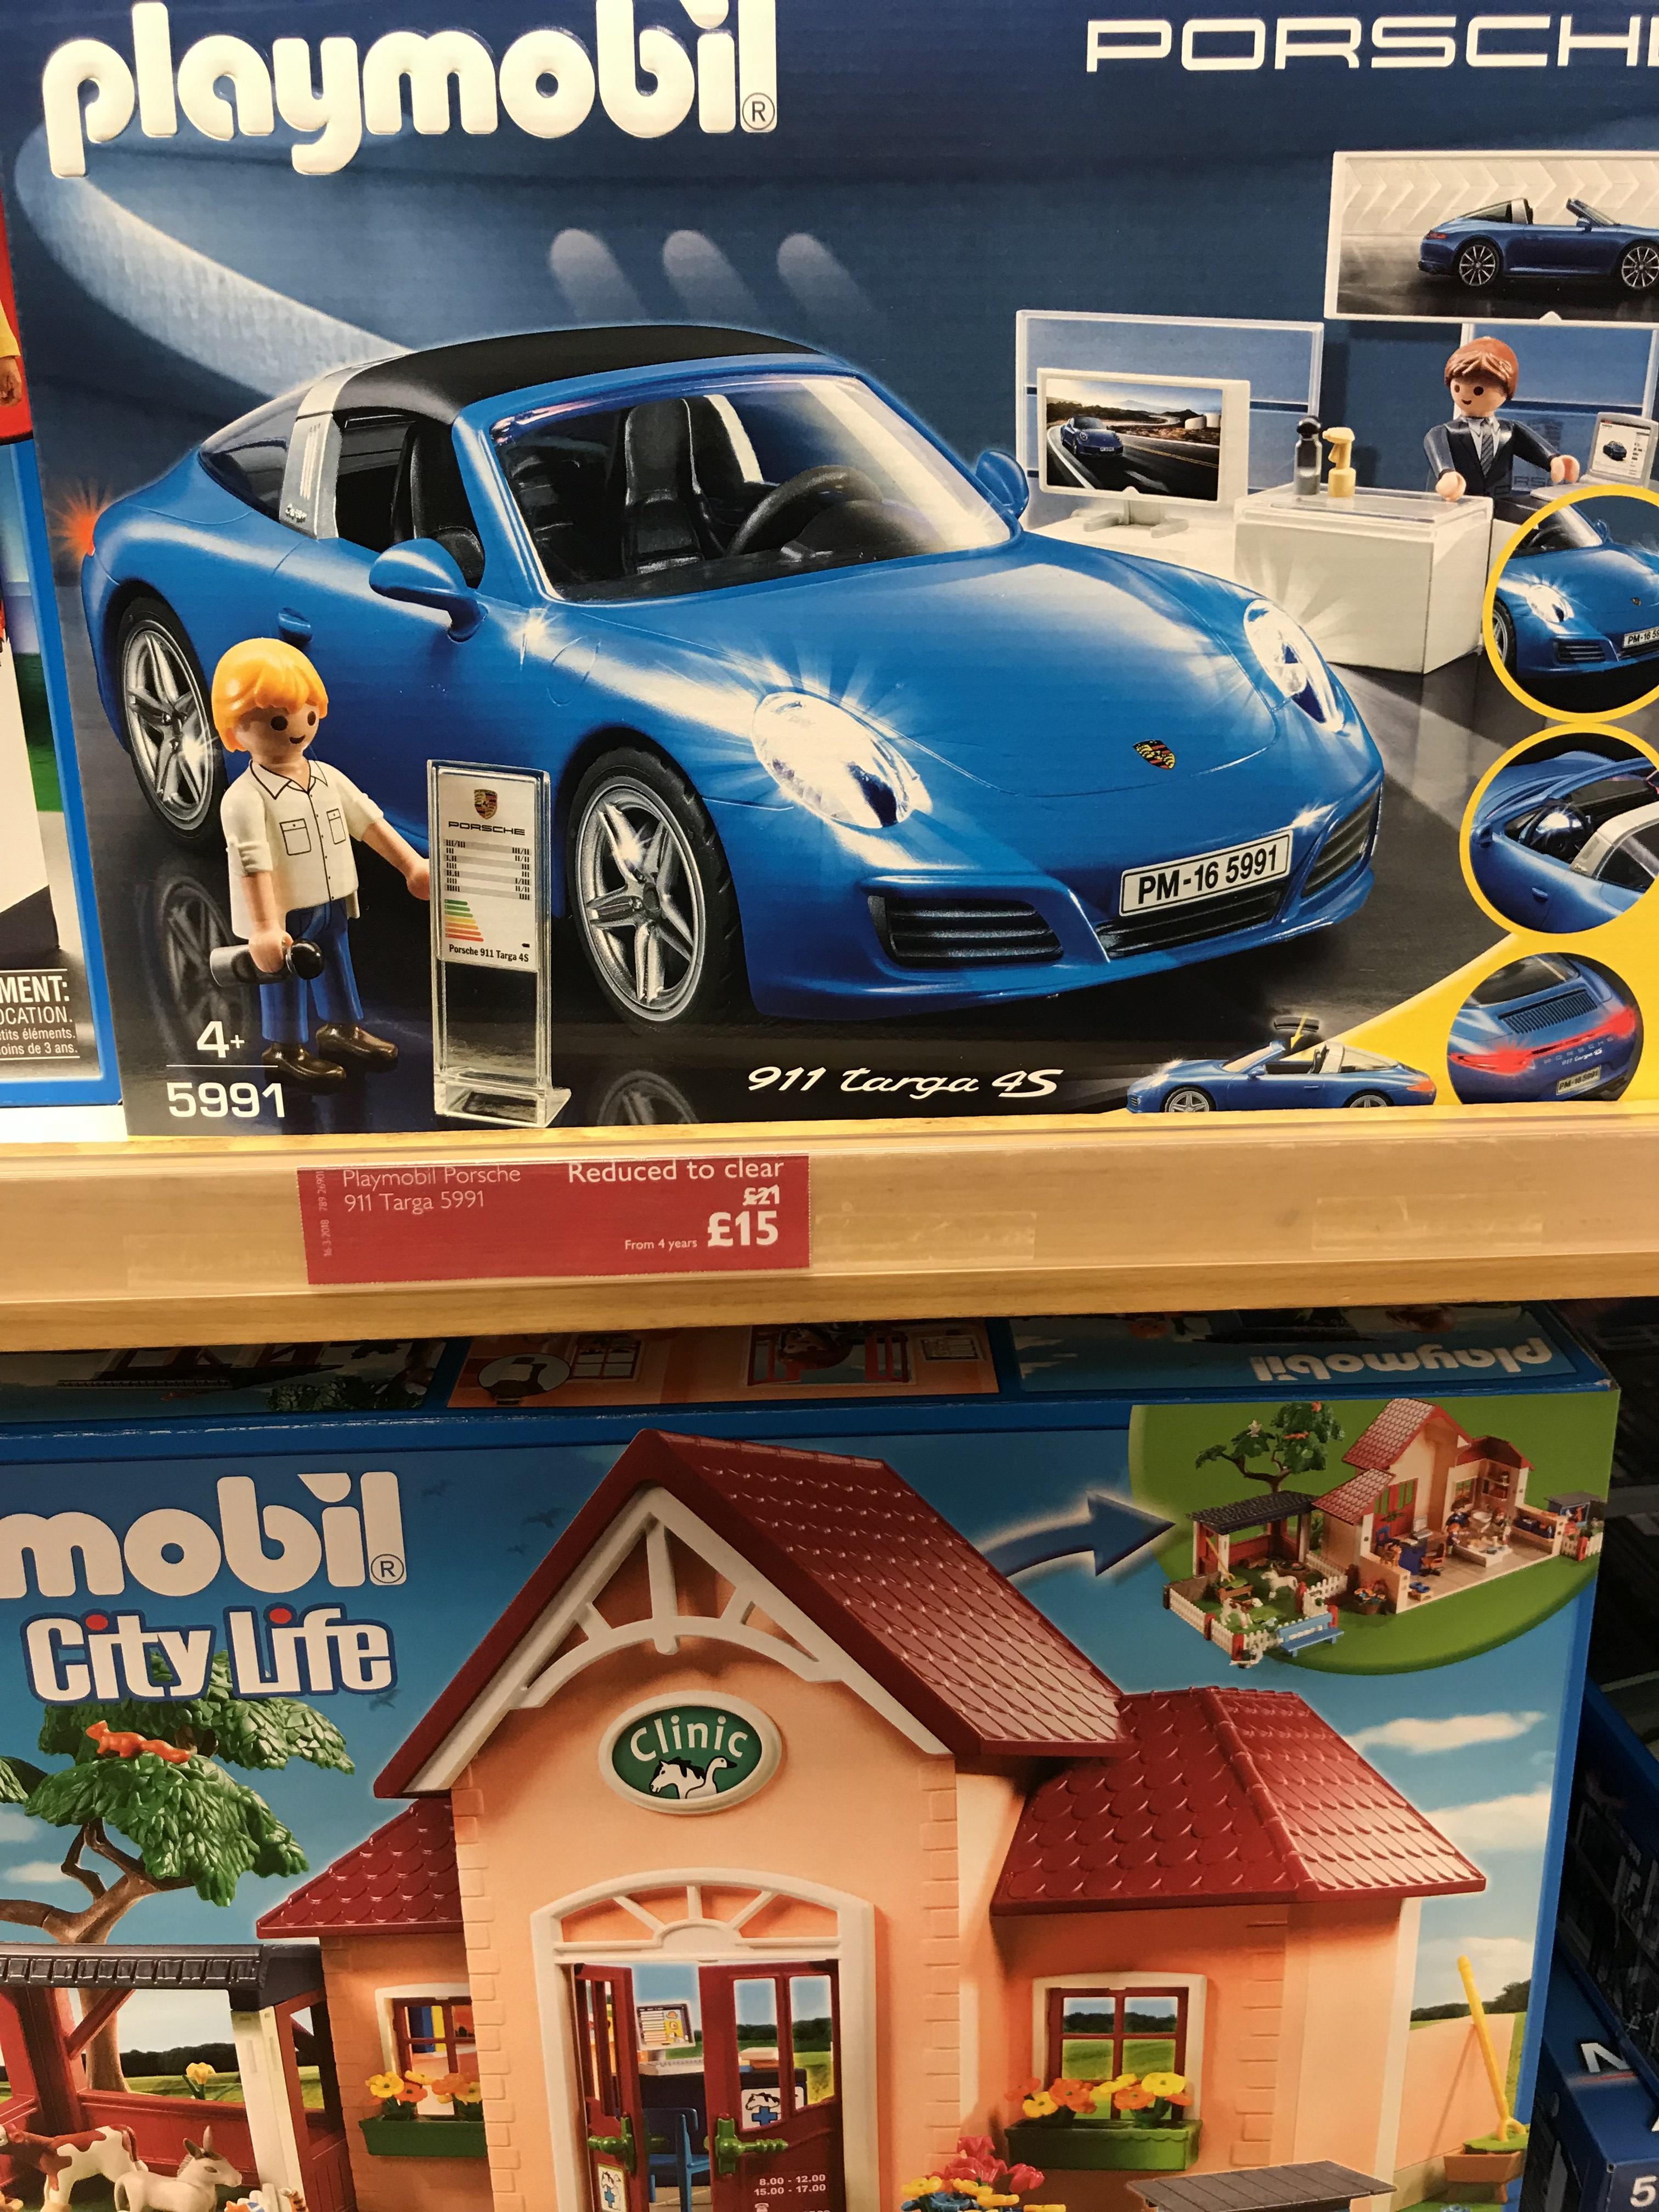 Playmobil Porsche 911 Targa (5991) £15 instore @ John Lewis (Kingston)